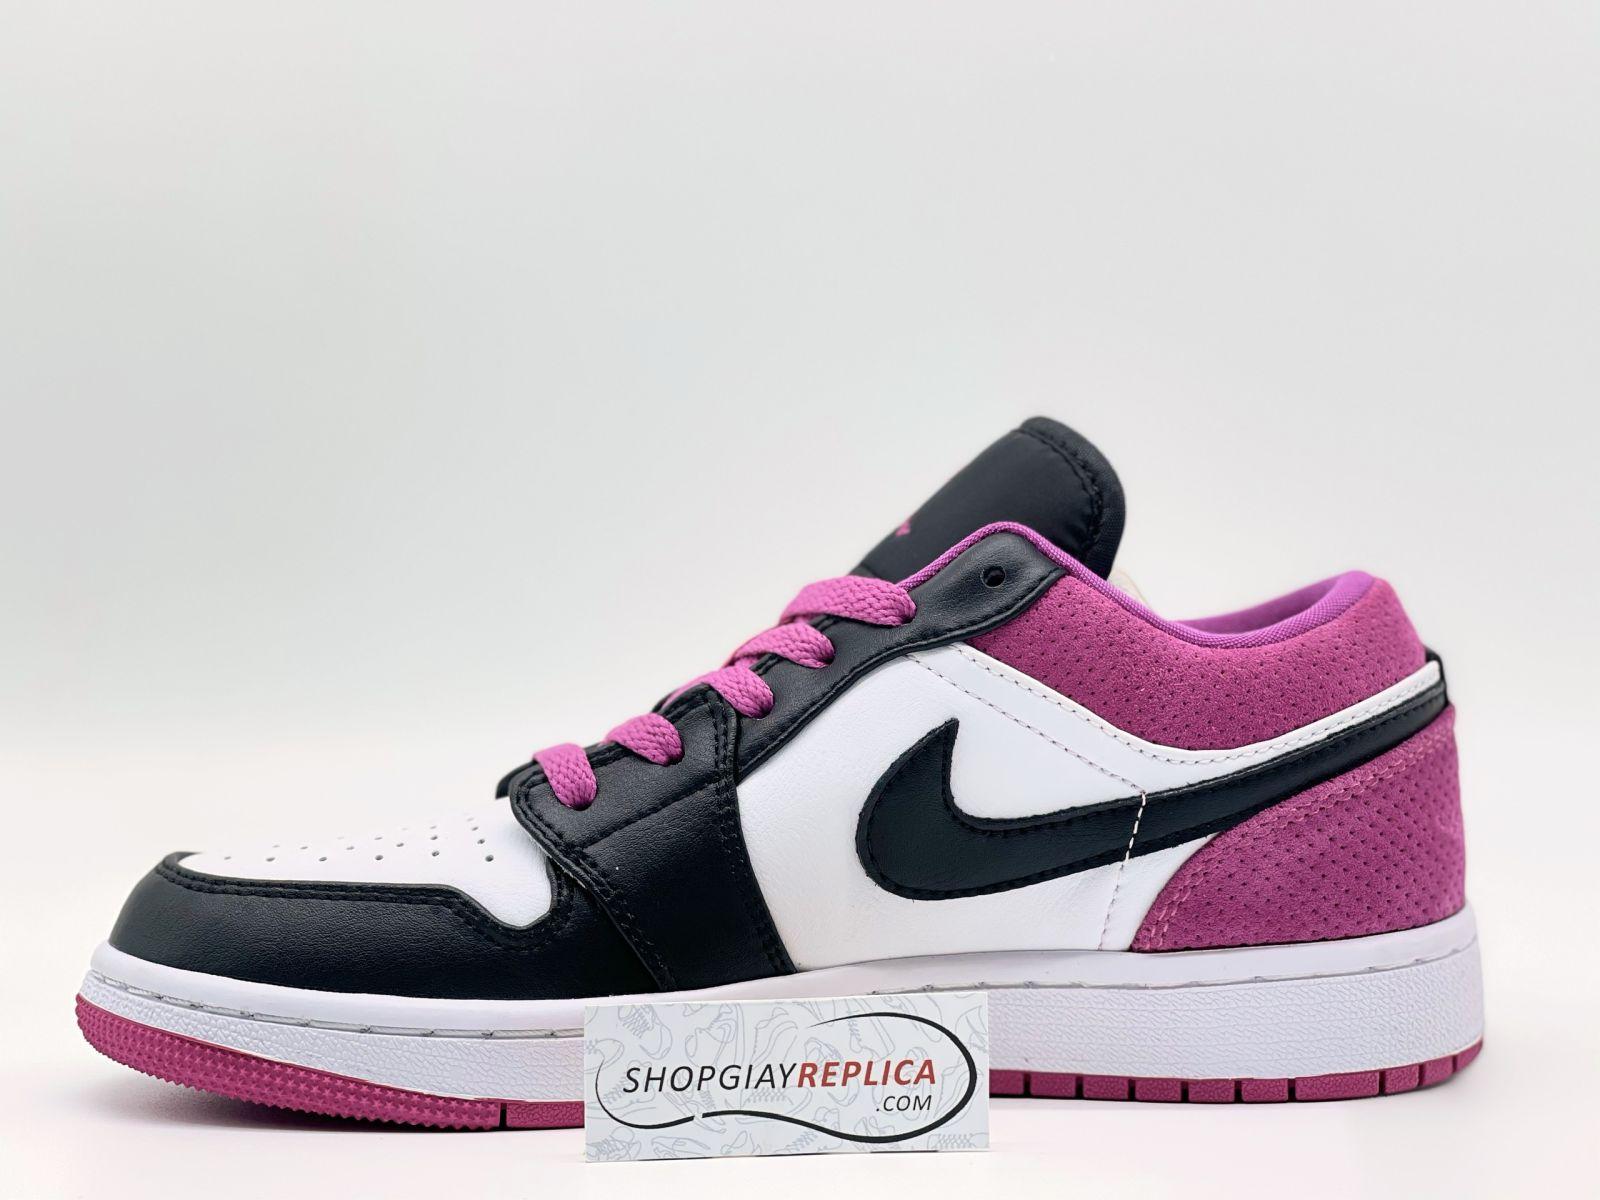 Giày Nike Air Jordan 1 Low Black Active Fuchsia Binz Rep11